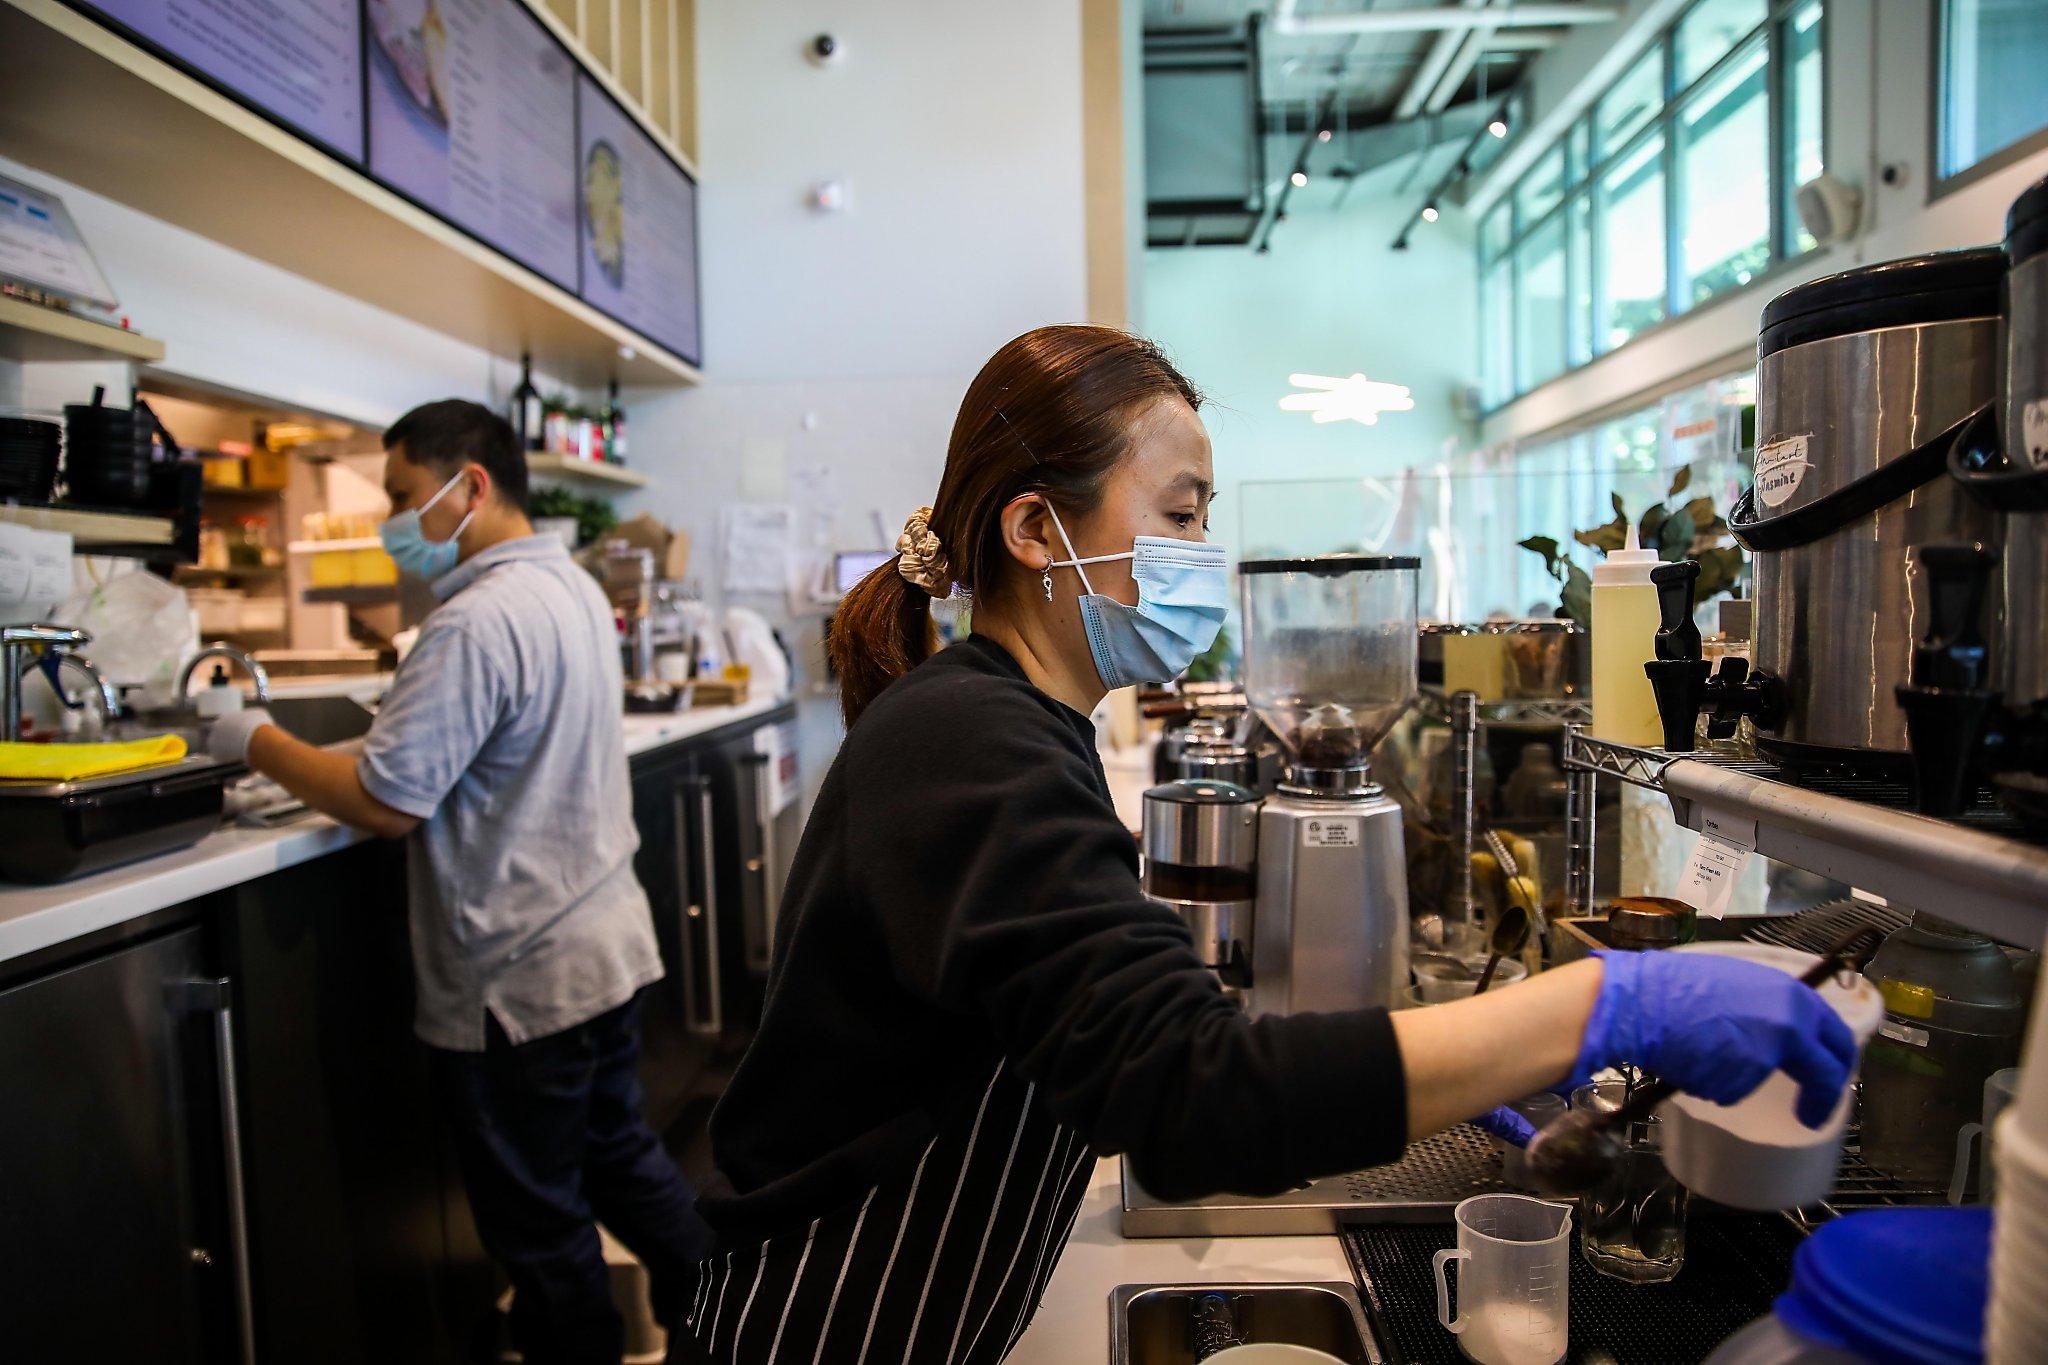 EDD says unemployed Californians must seek work to keep receiving benefits